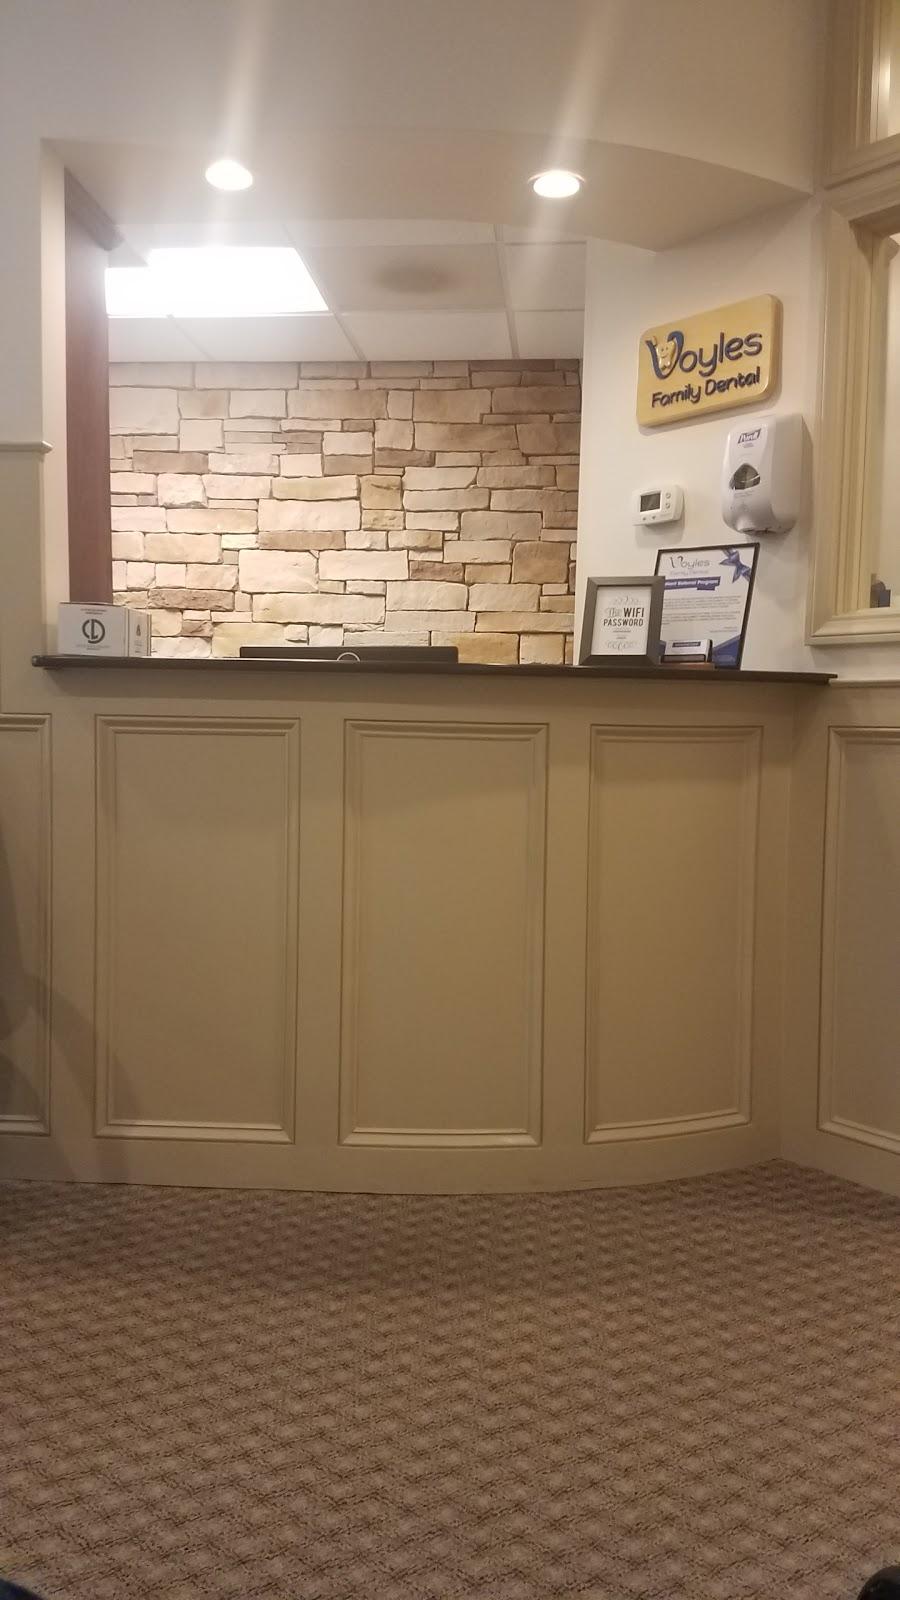 Voyles Family Dental - dentist  | Photo 2 of 3 | Address: 3511 Main St, Hilliard, OH 43026, USA | Phone: (614) 876-1241